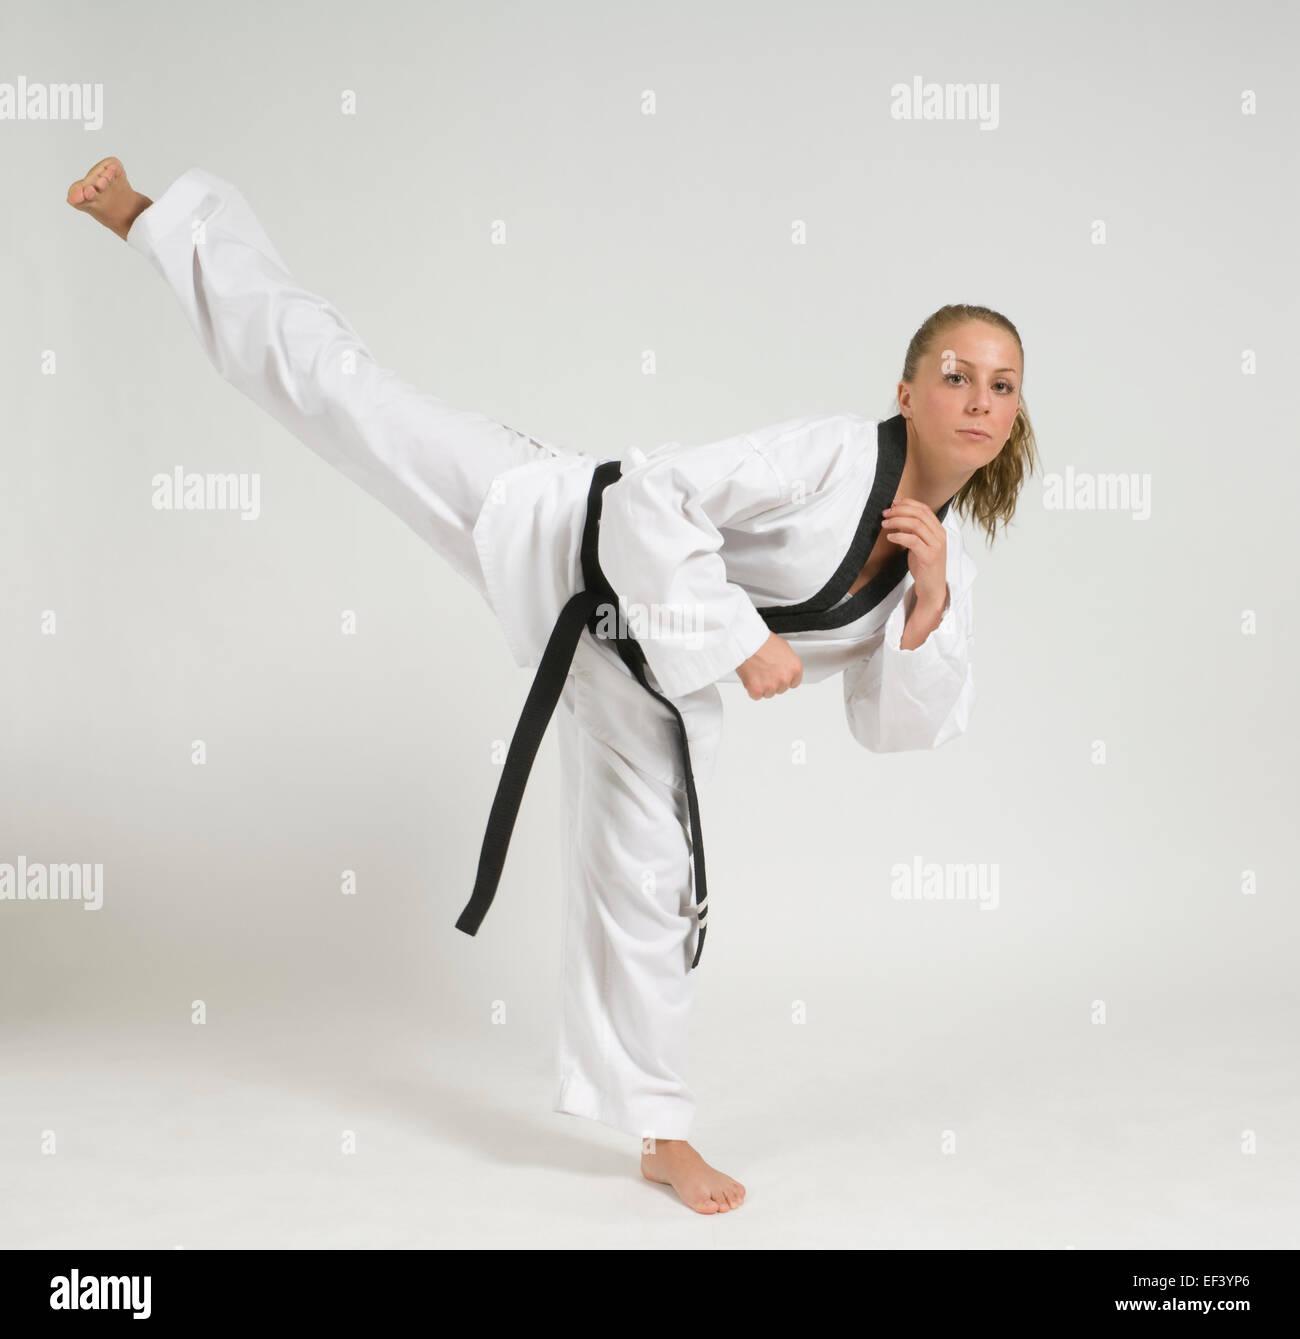 Woman wearing karate uniform  sc 1 st  Alamy & Woman wearing karate uniform Stock Photo: 78148958 - Alamy